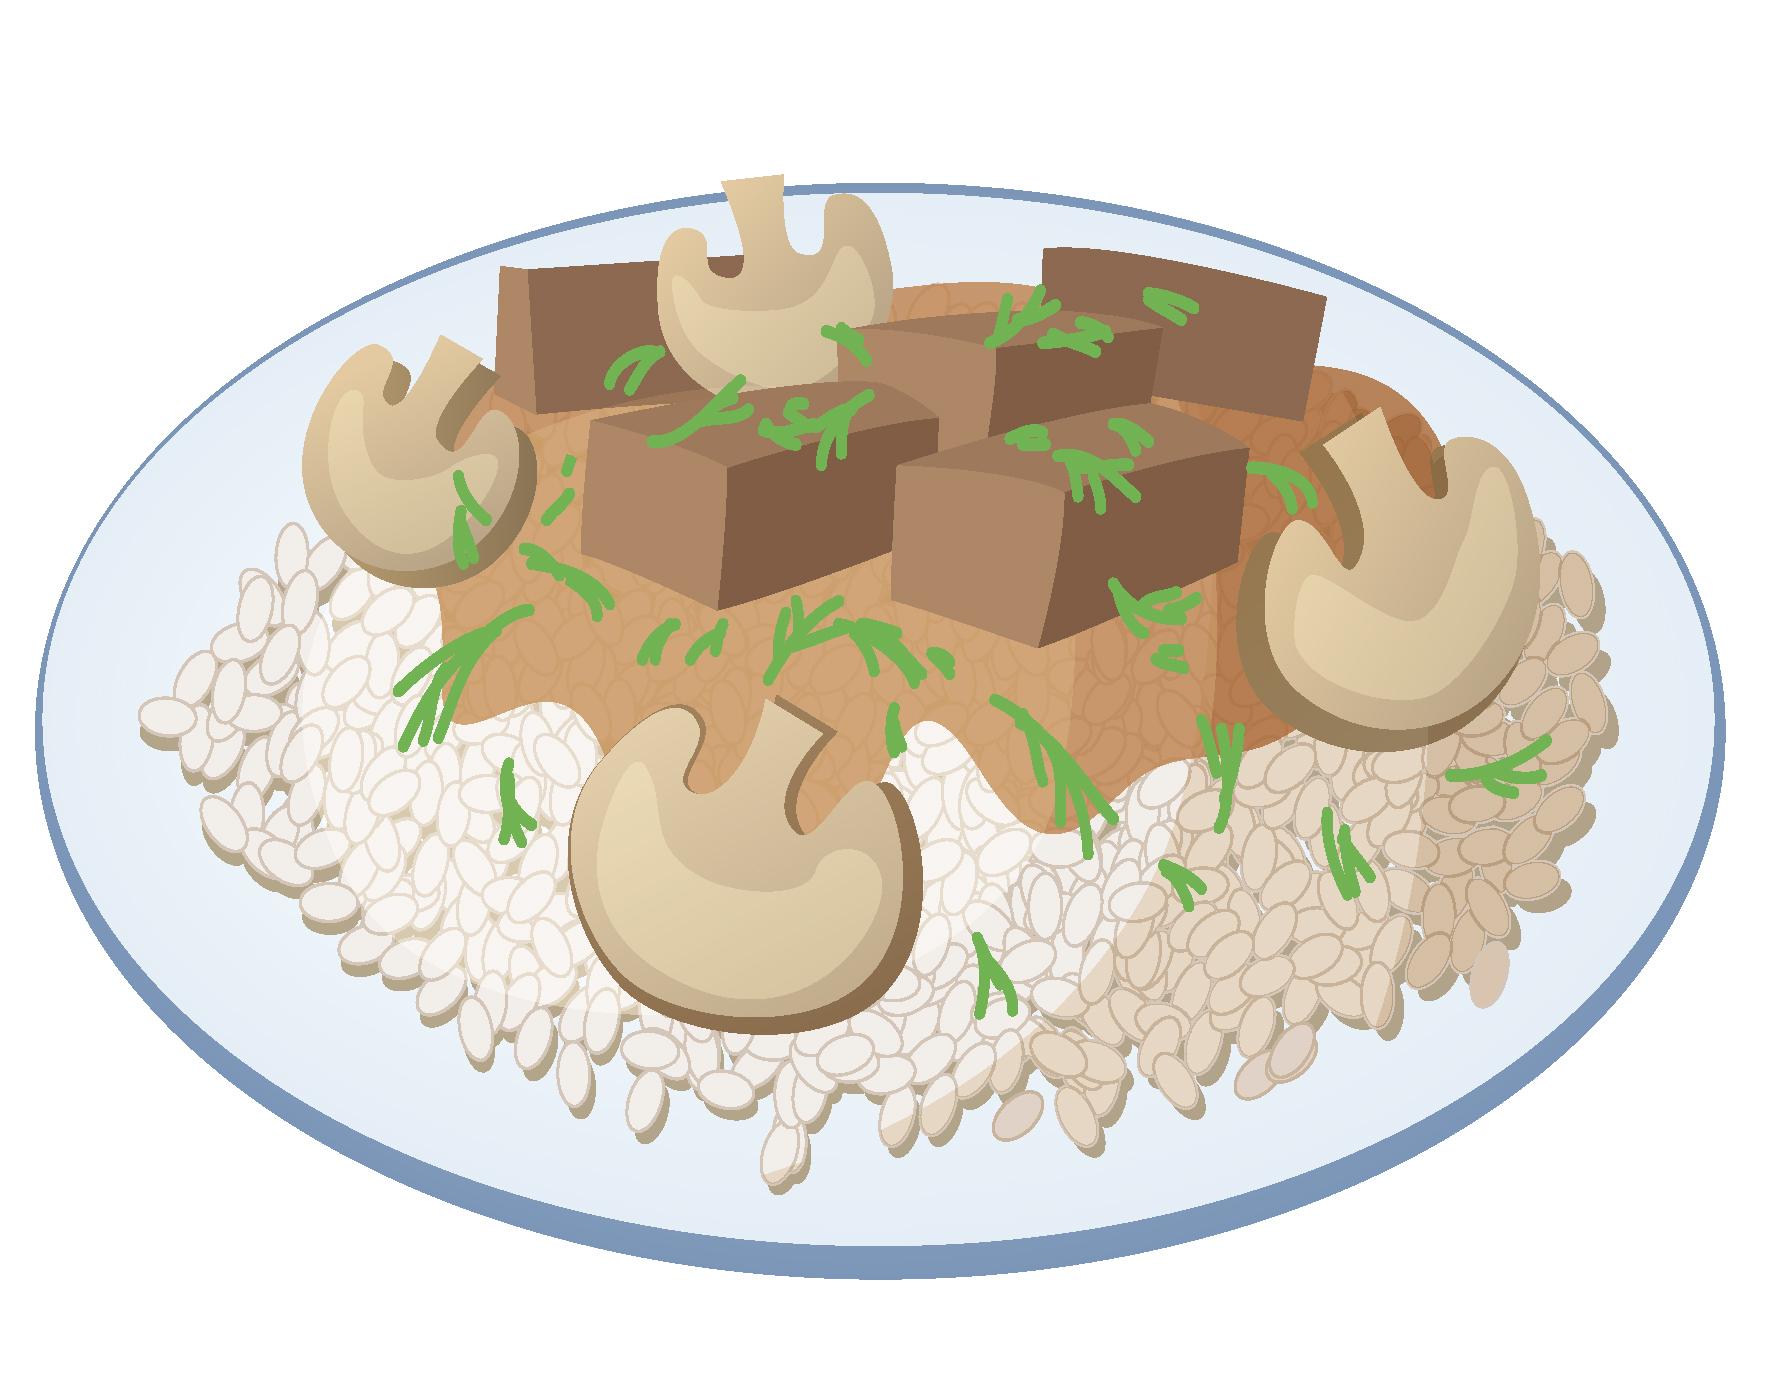 1772x1378 Cartoon Rice Bowl Vector Element Free Download Ai Files